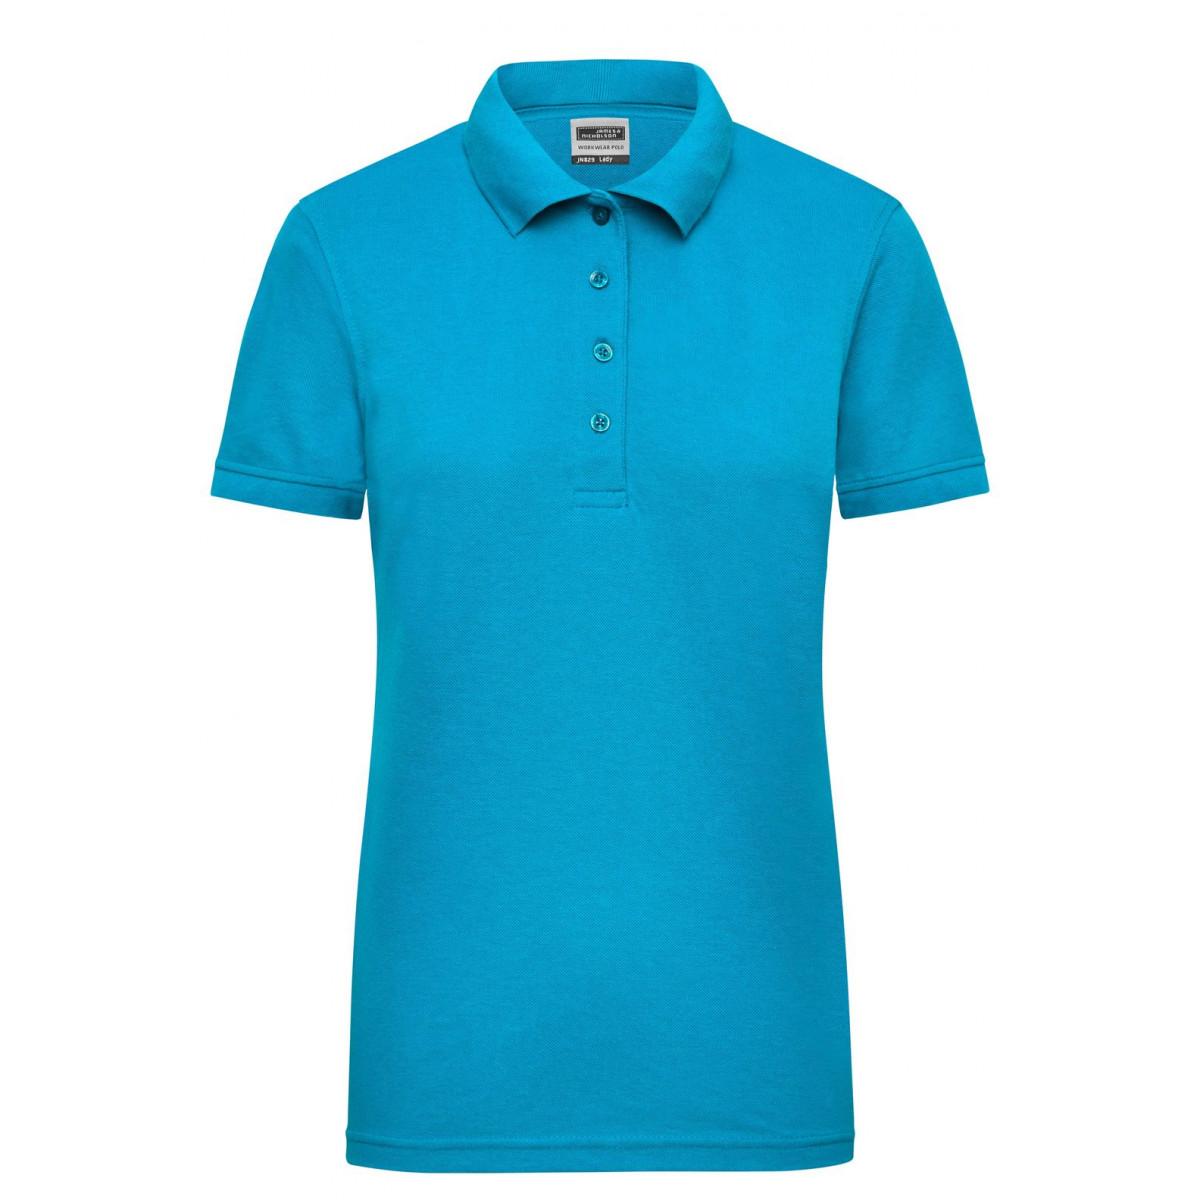 Рубашка поло женская JN829 Ladies Workwear Polo - Бирюзовый